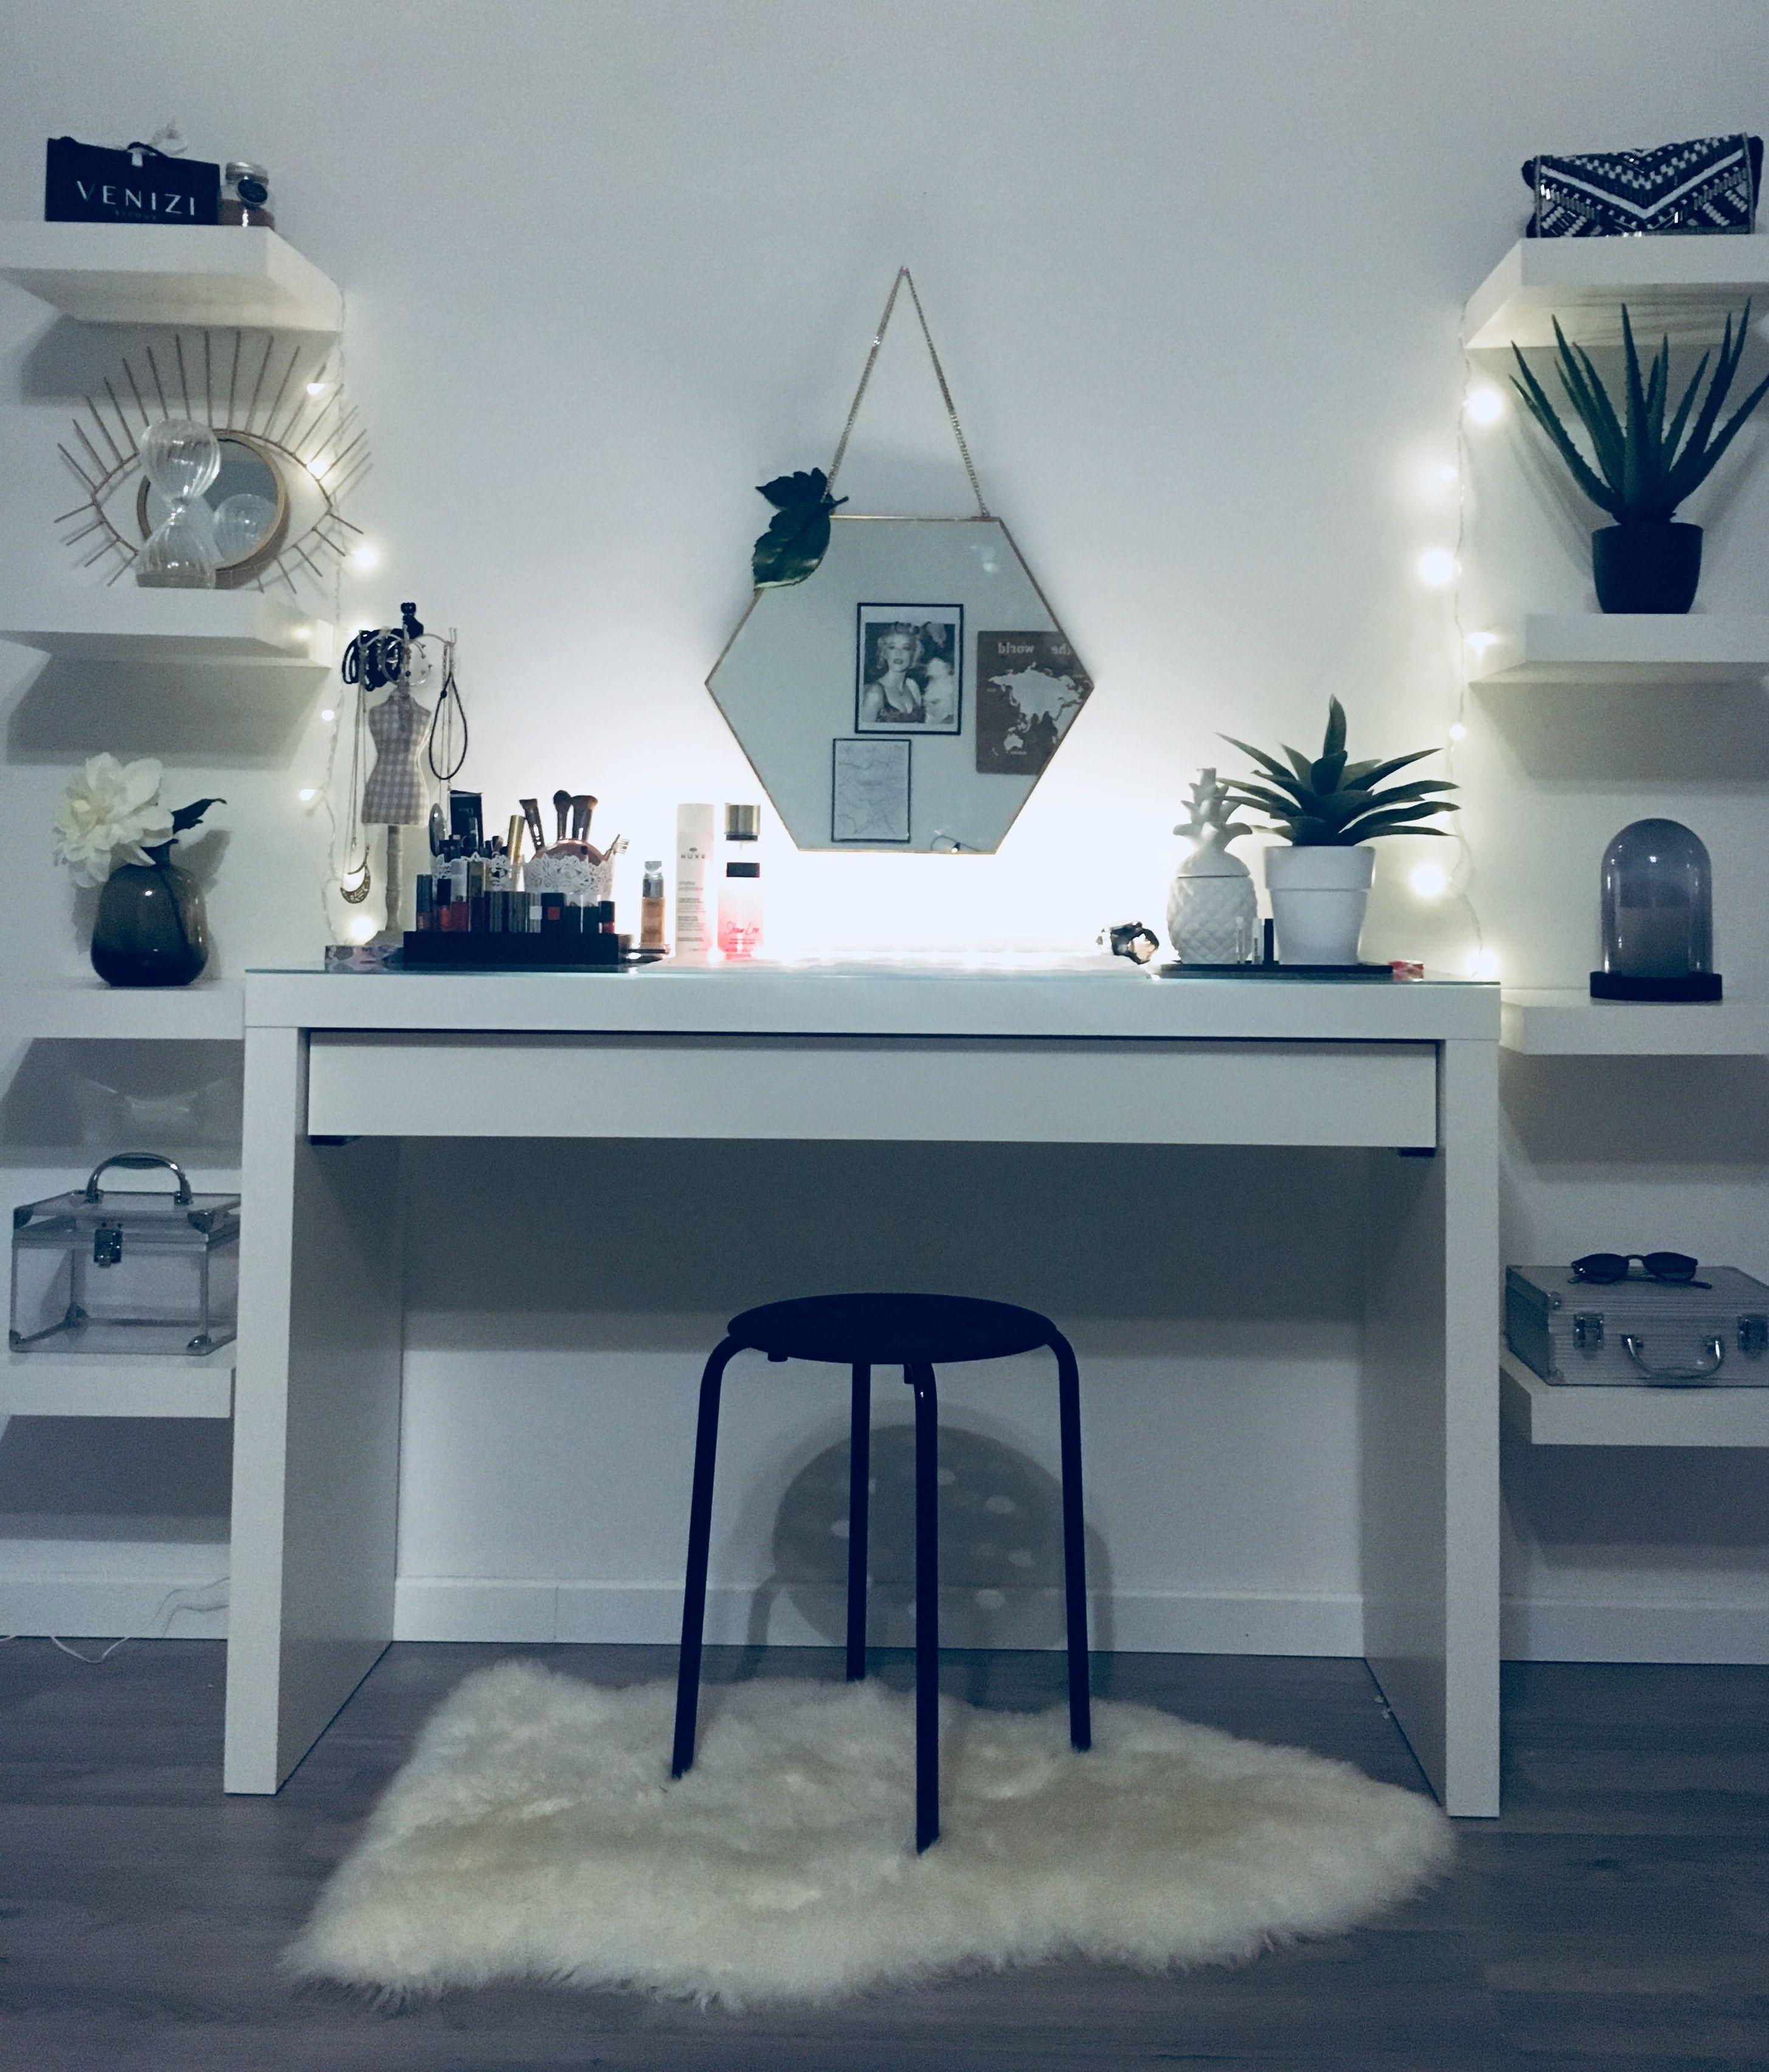 Wonderful Pictures Pinterest : whywhyn0t  Tips   Purchasing a well-designed sofa… Genç odası